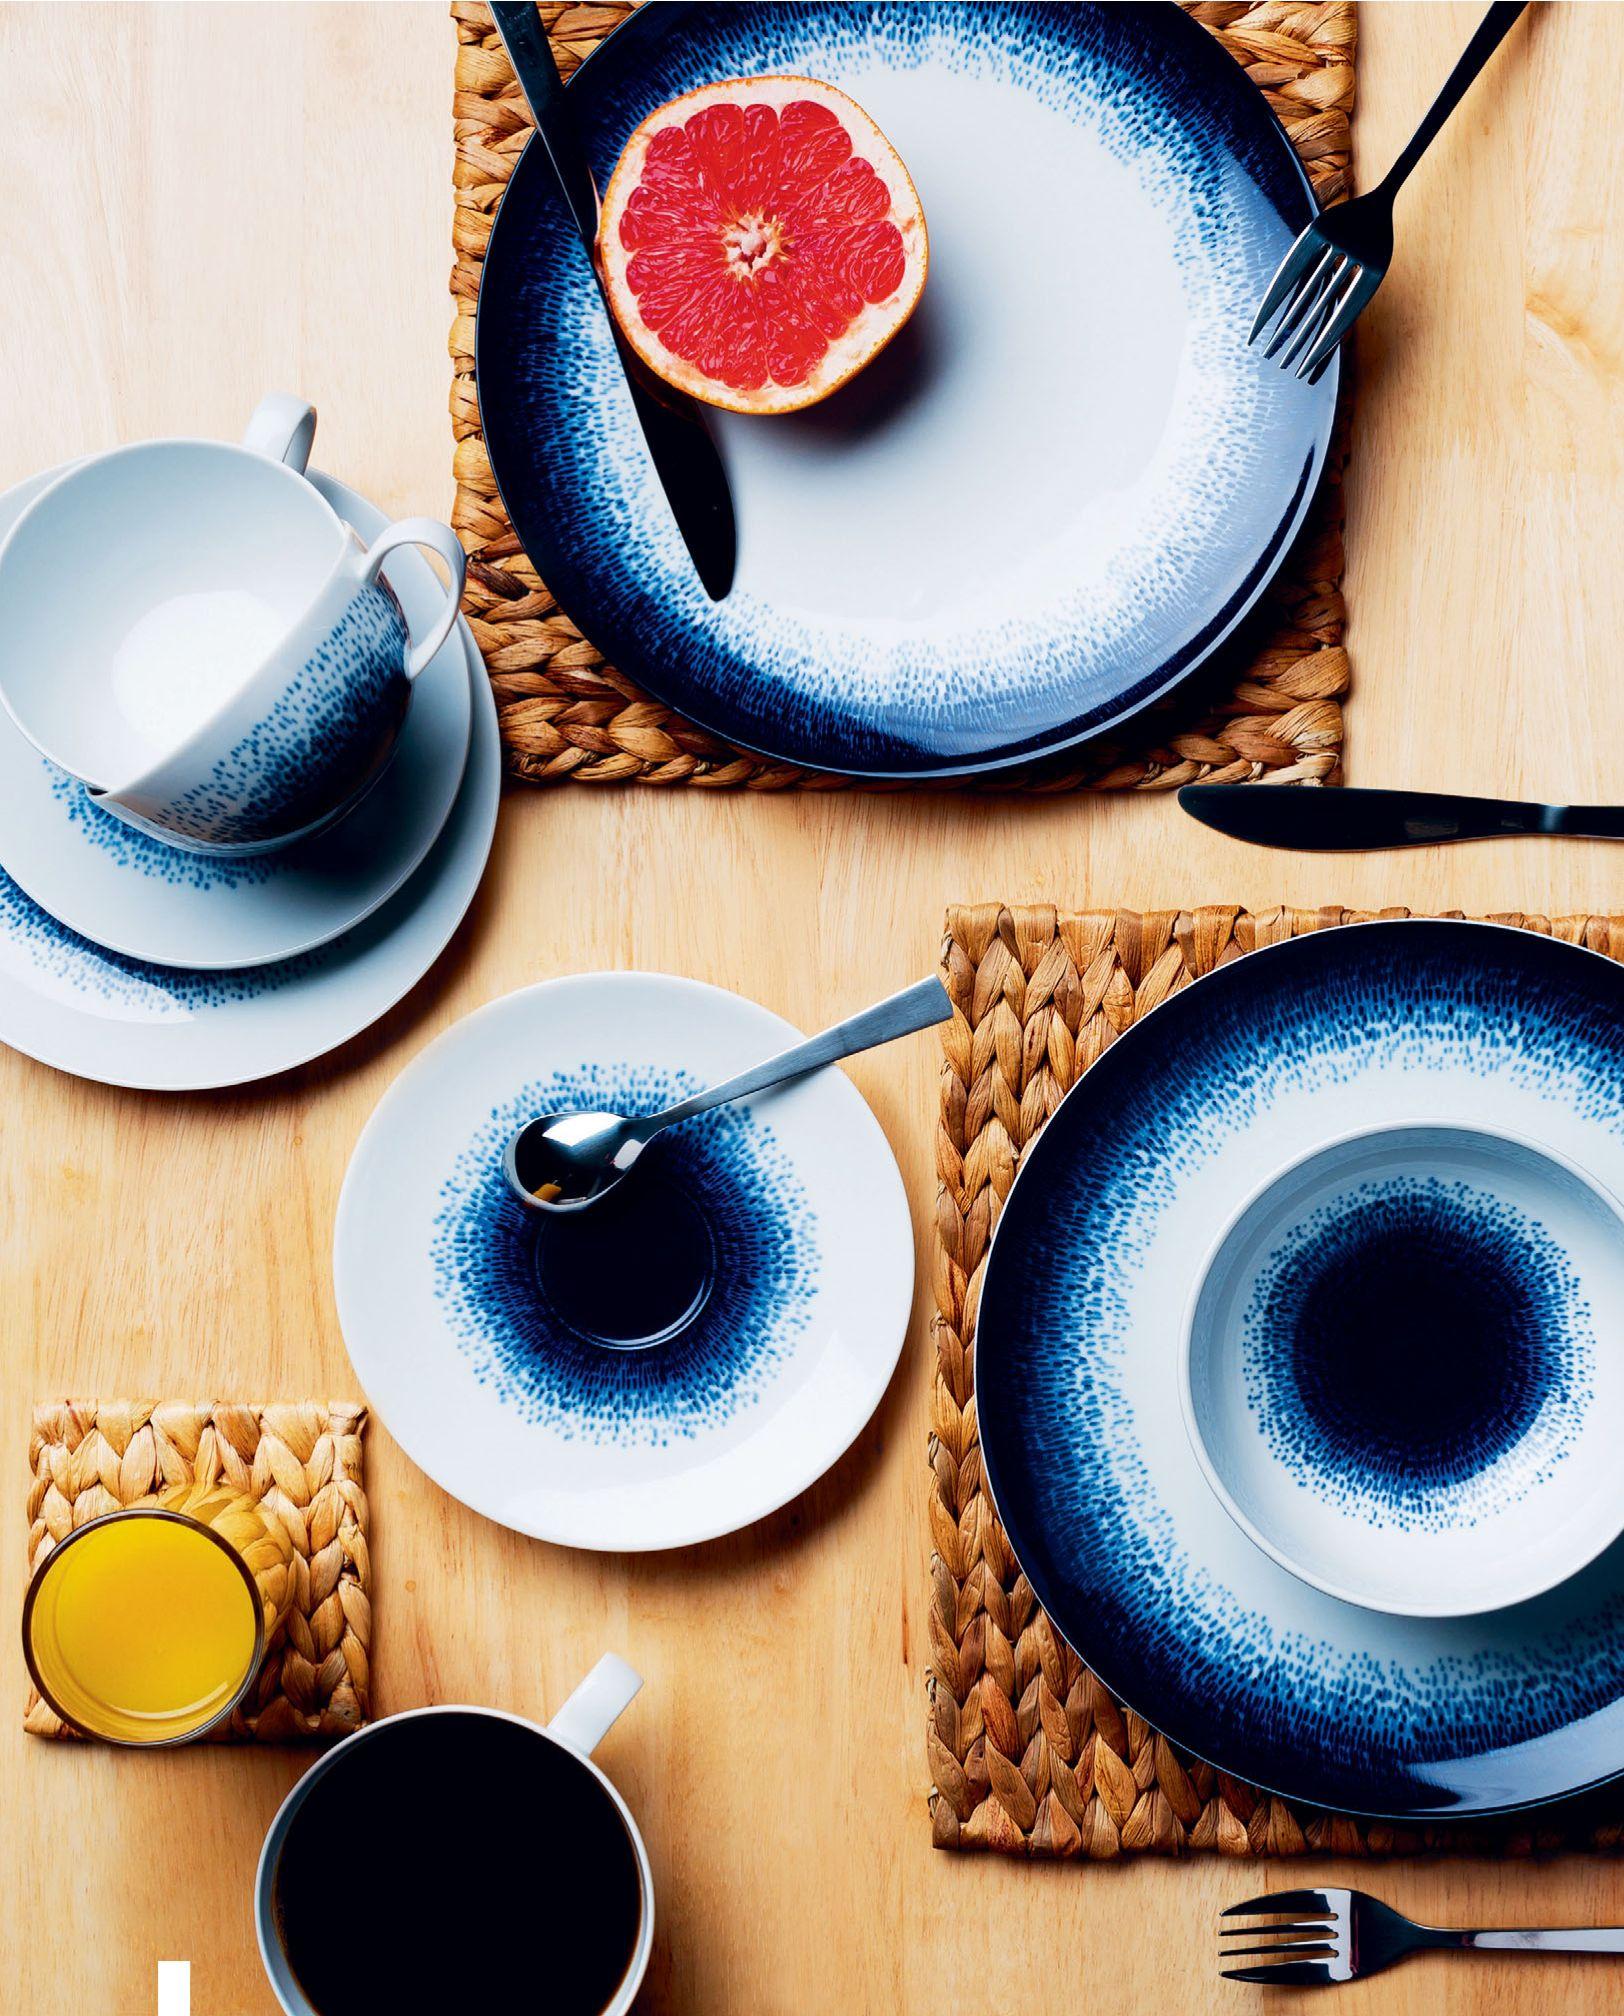 Blue Dye Crockery Tesco With Images Crockery